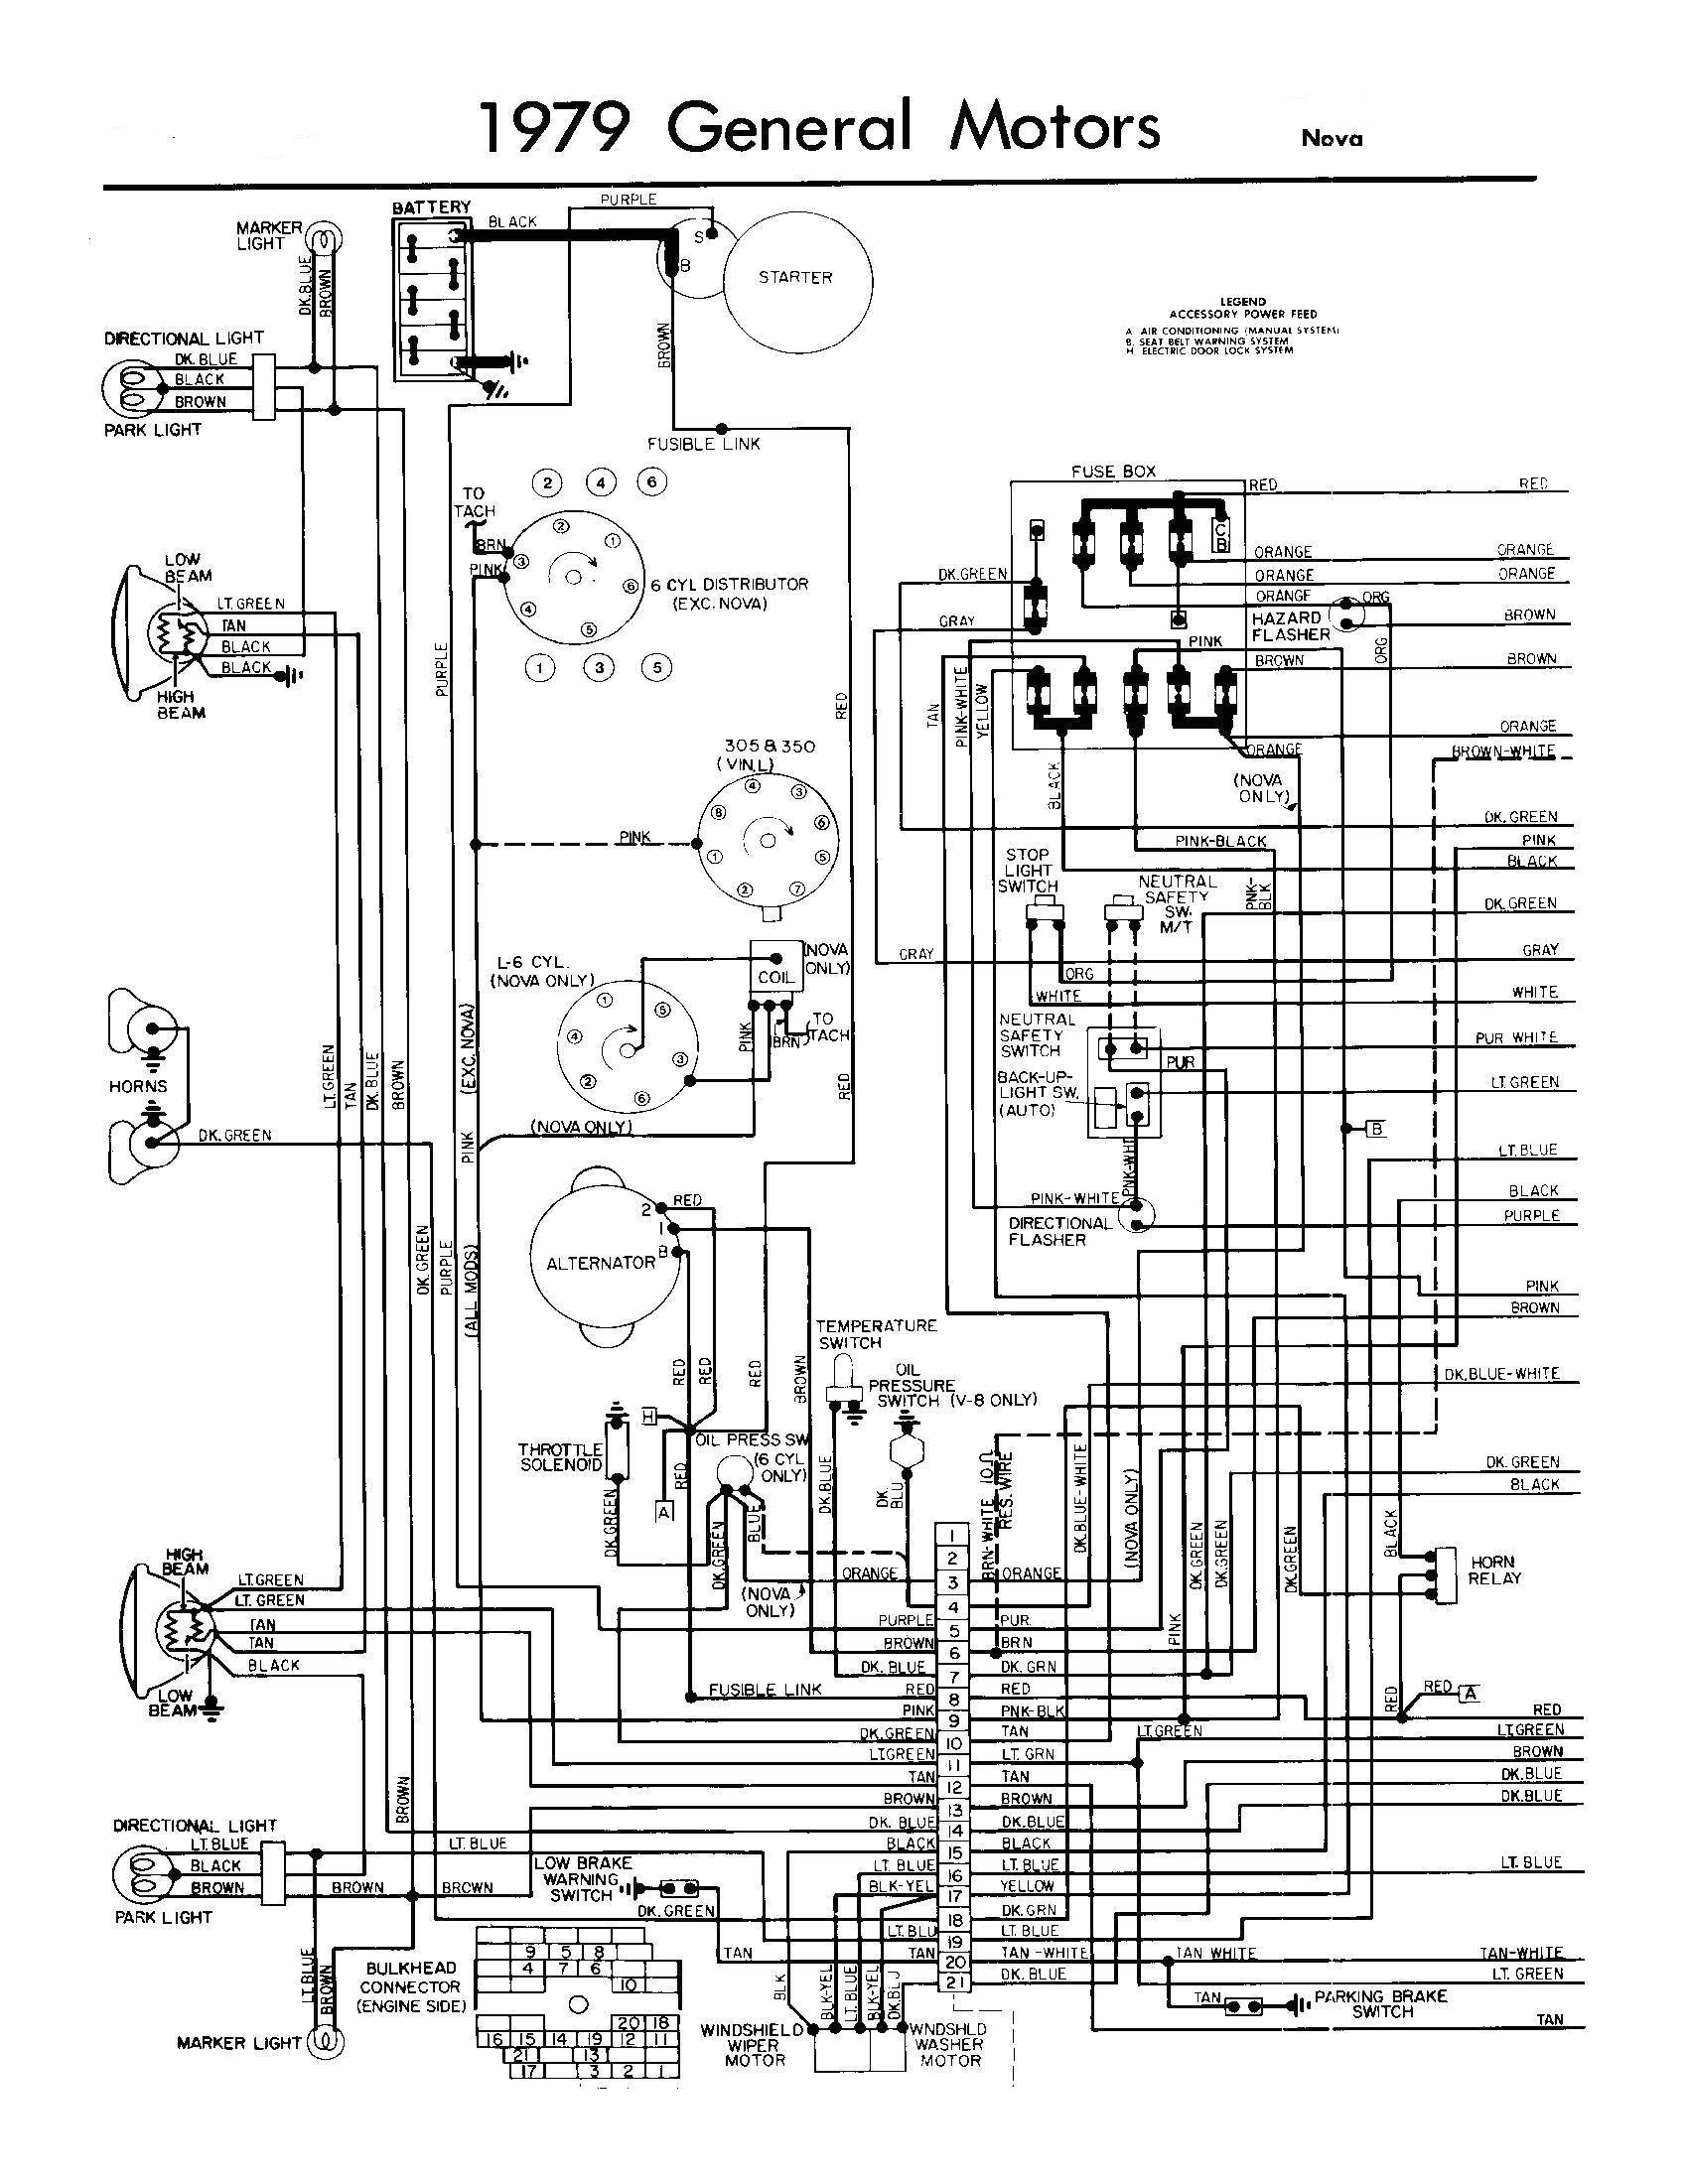 95 s10 wiring harness diagram wiring diagram fascinating 1995 s10 ignition wiring diagram 1995 s10 wiring diagram